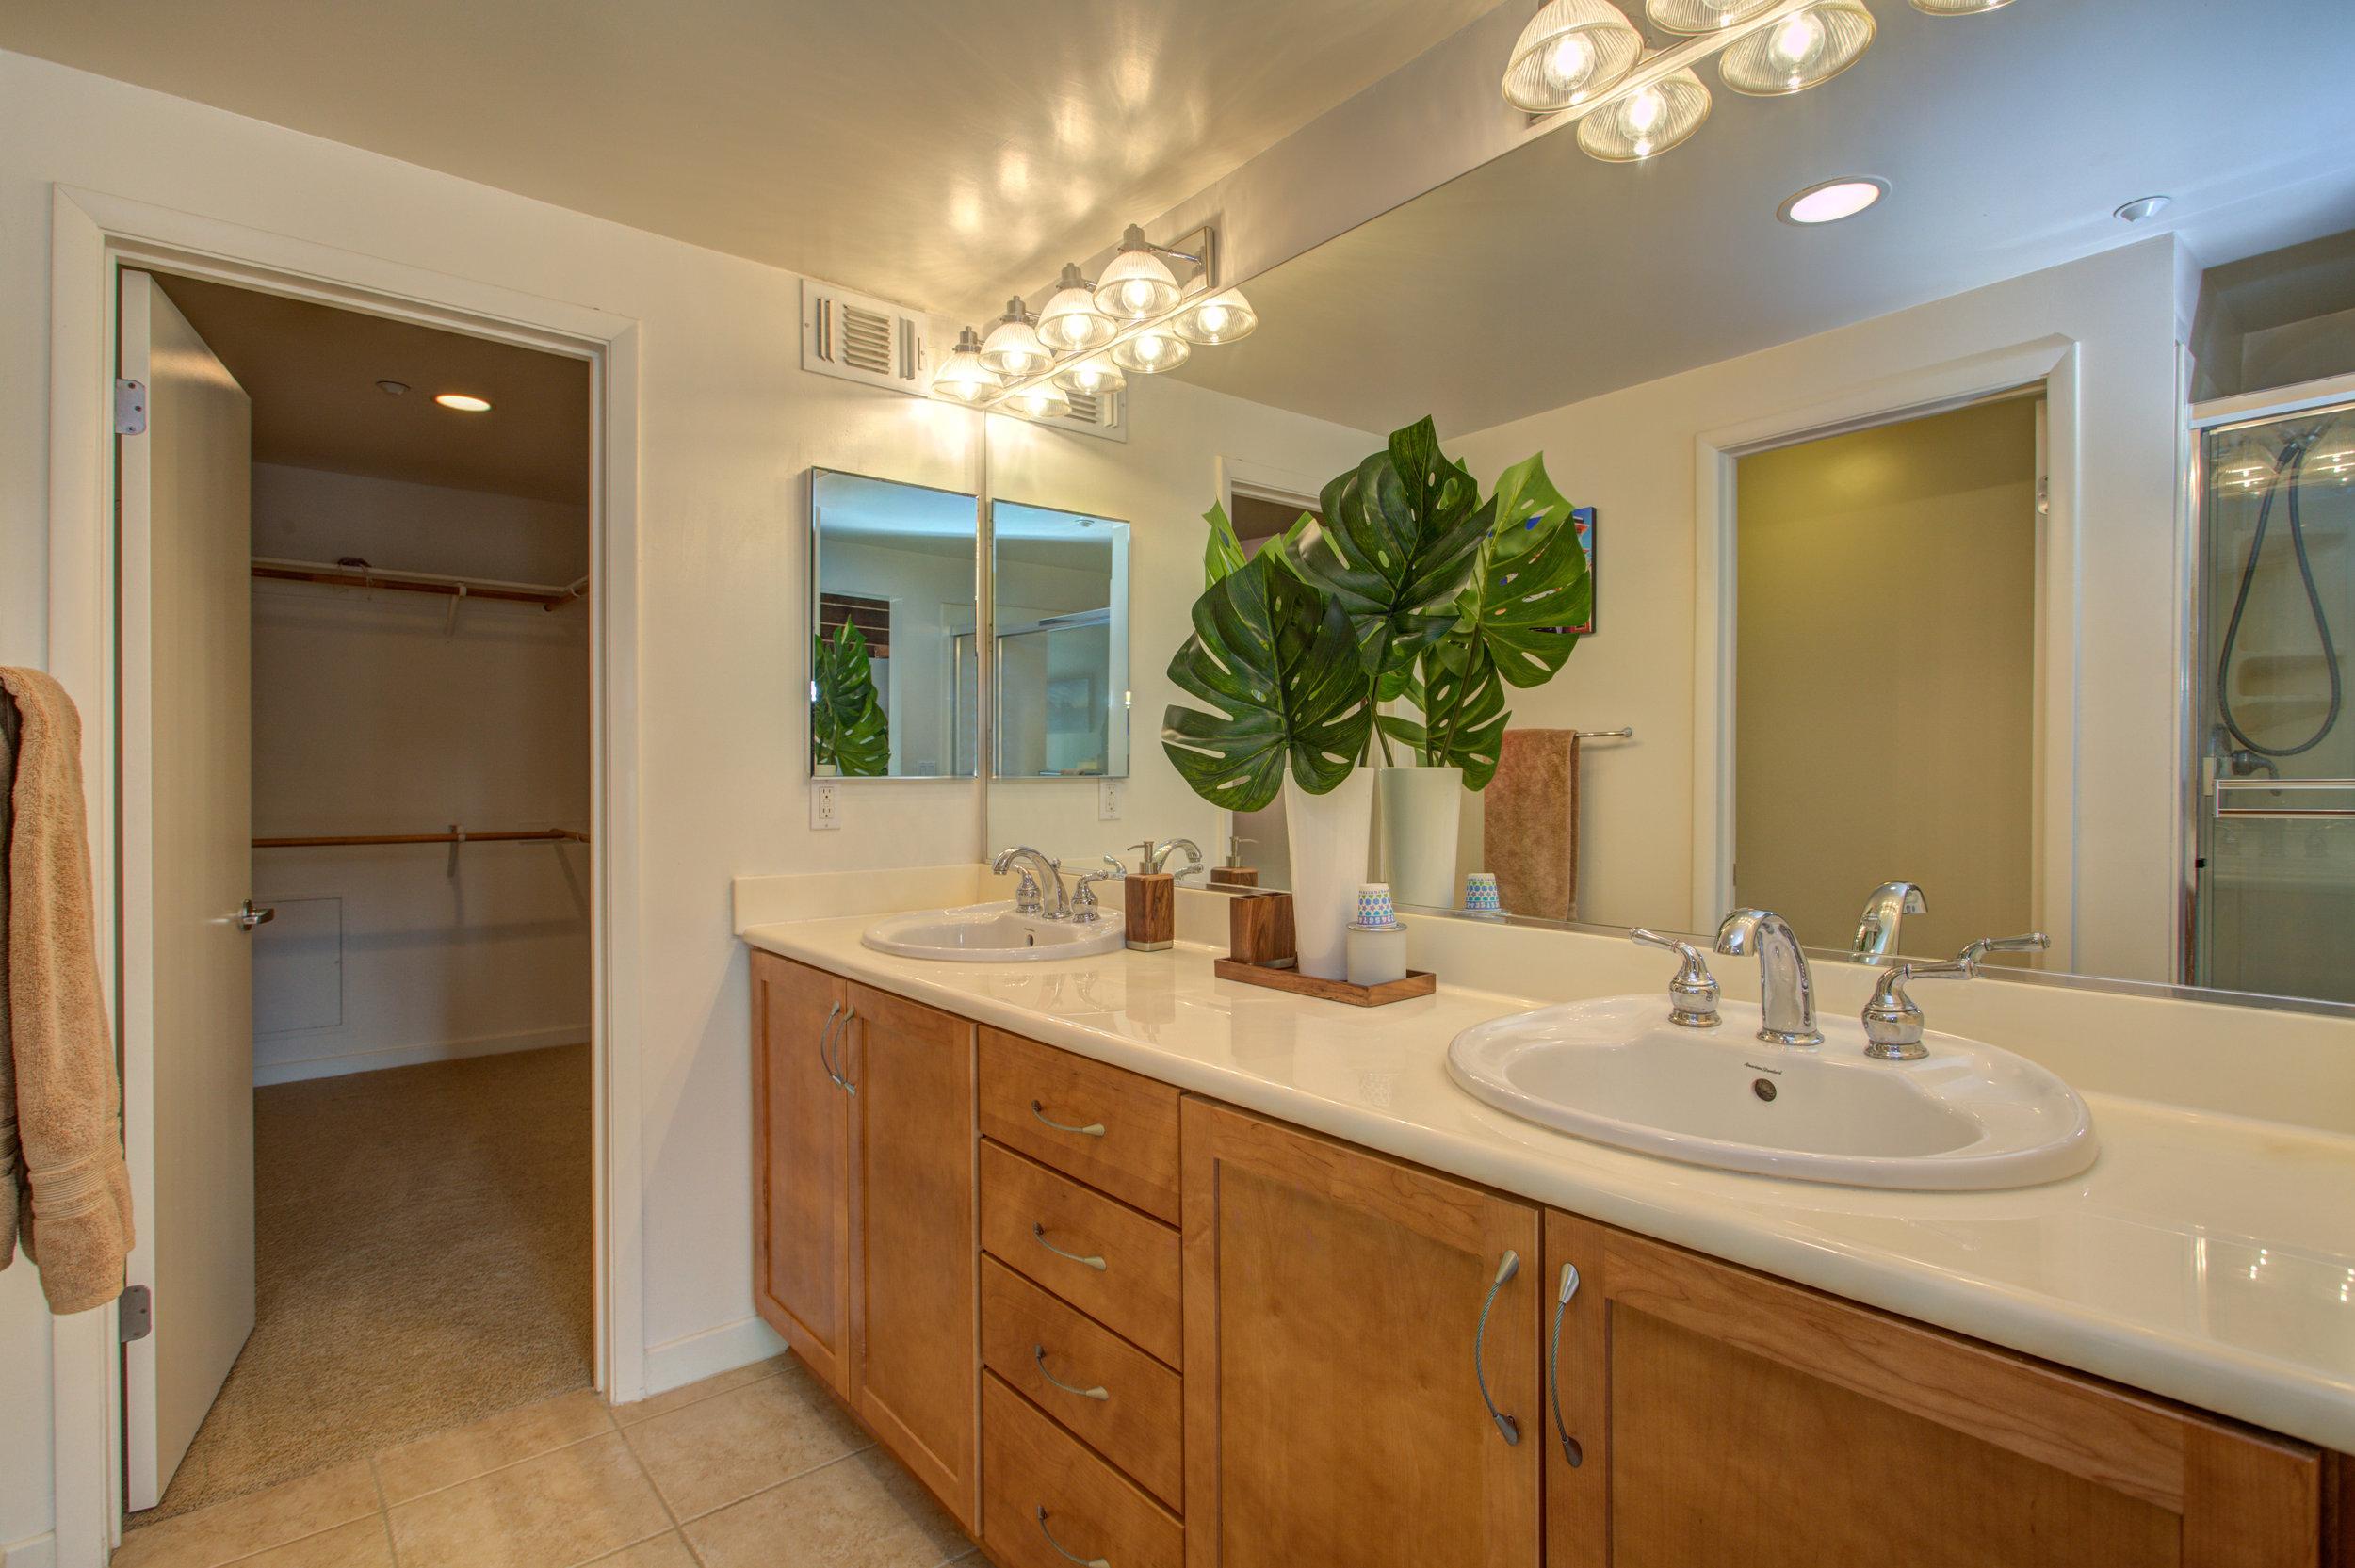 582_manzana_place_MLS_HID1169117_ROOMmasterbathroom.jpg